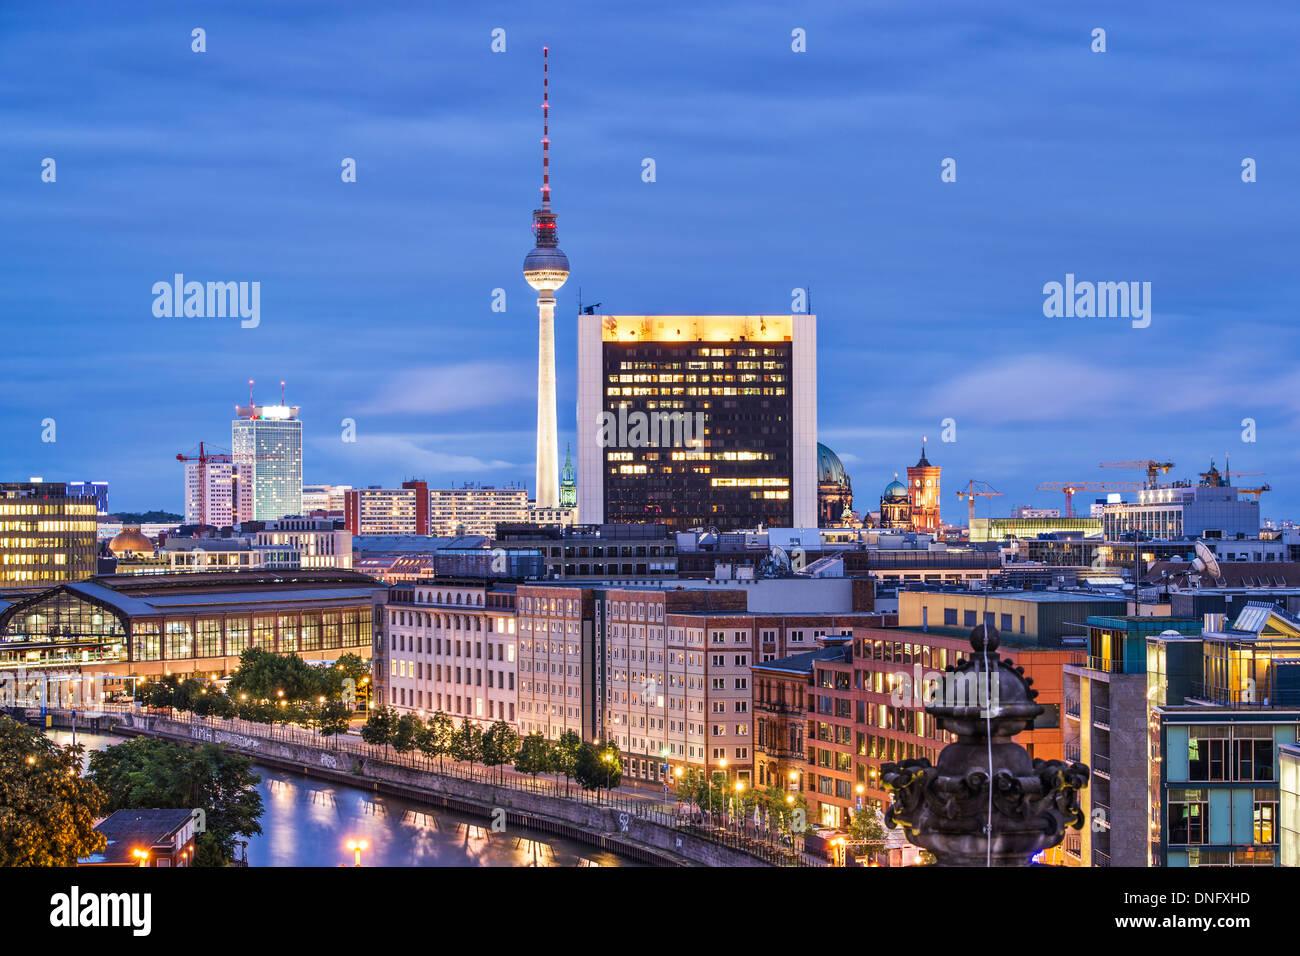 Paysage urbain de Berlin, Allemagne. Photo Stock